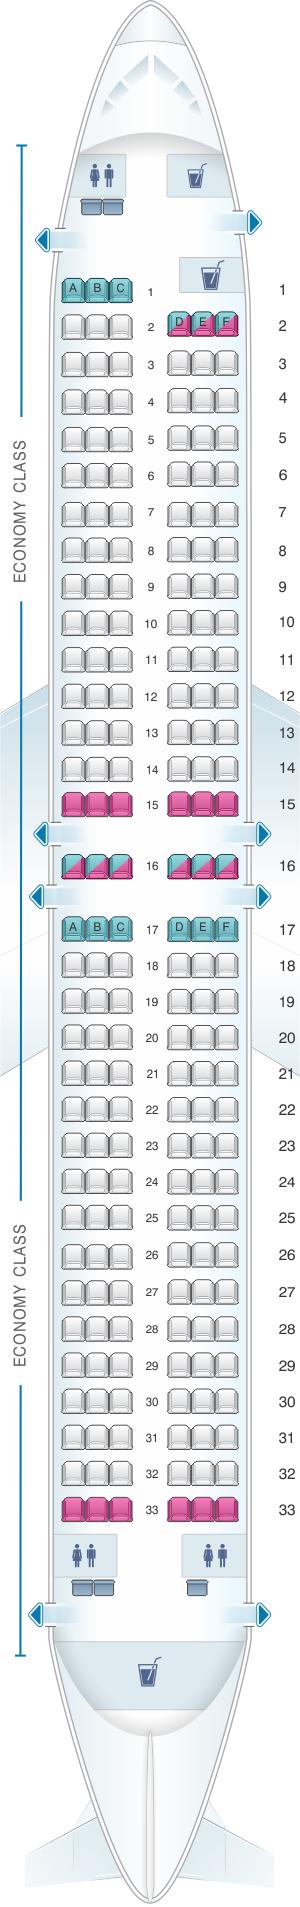 Seat Map Rossiya Airlines Boeing B737 800 195PAX Rossiya